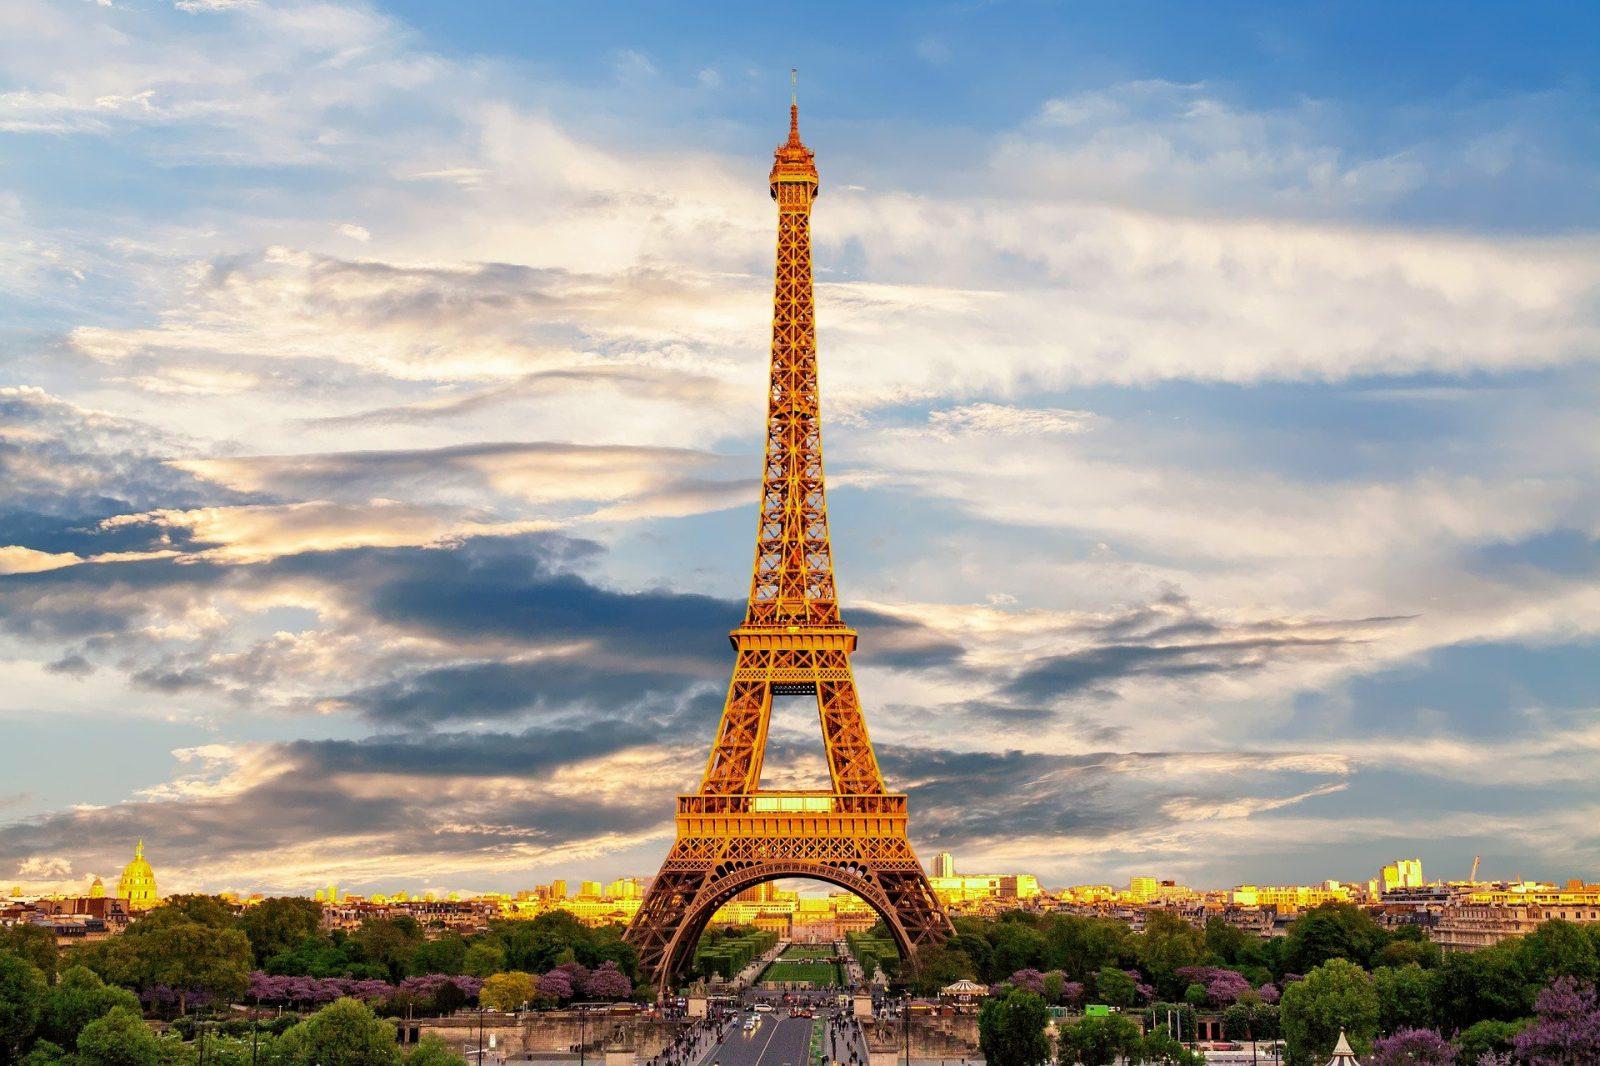 Evropski gradovi, Evropska putovanja, Evropske metropole, Pariz